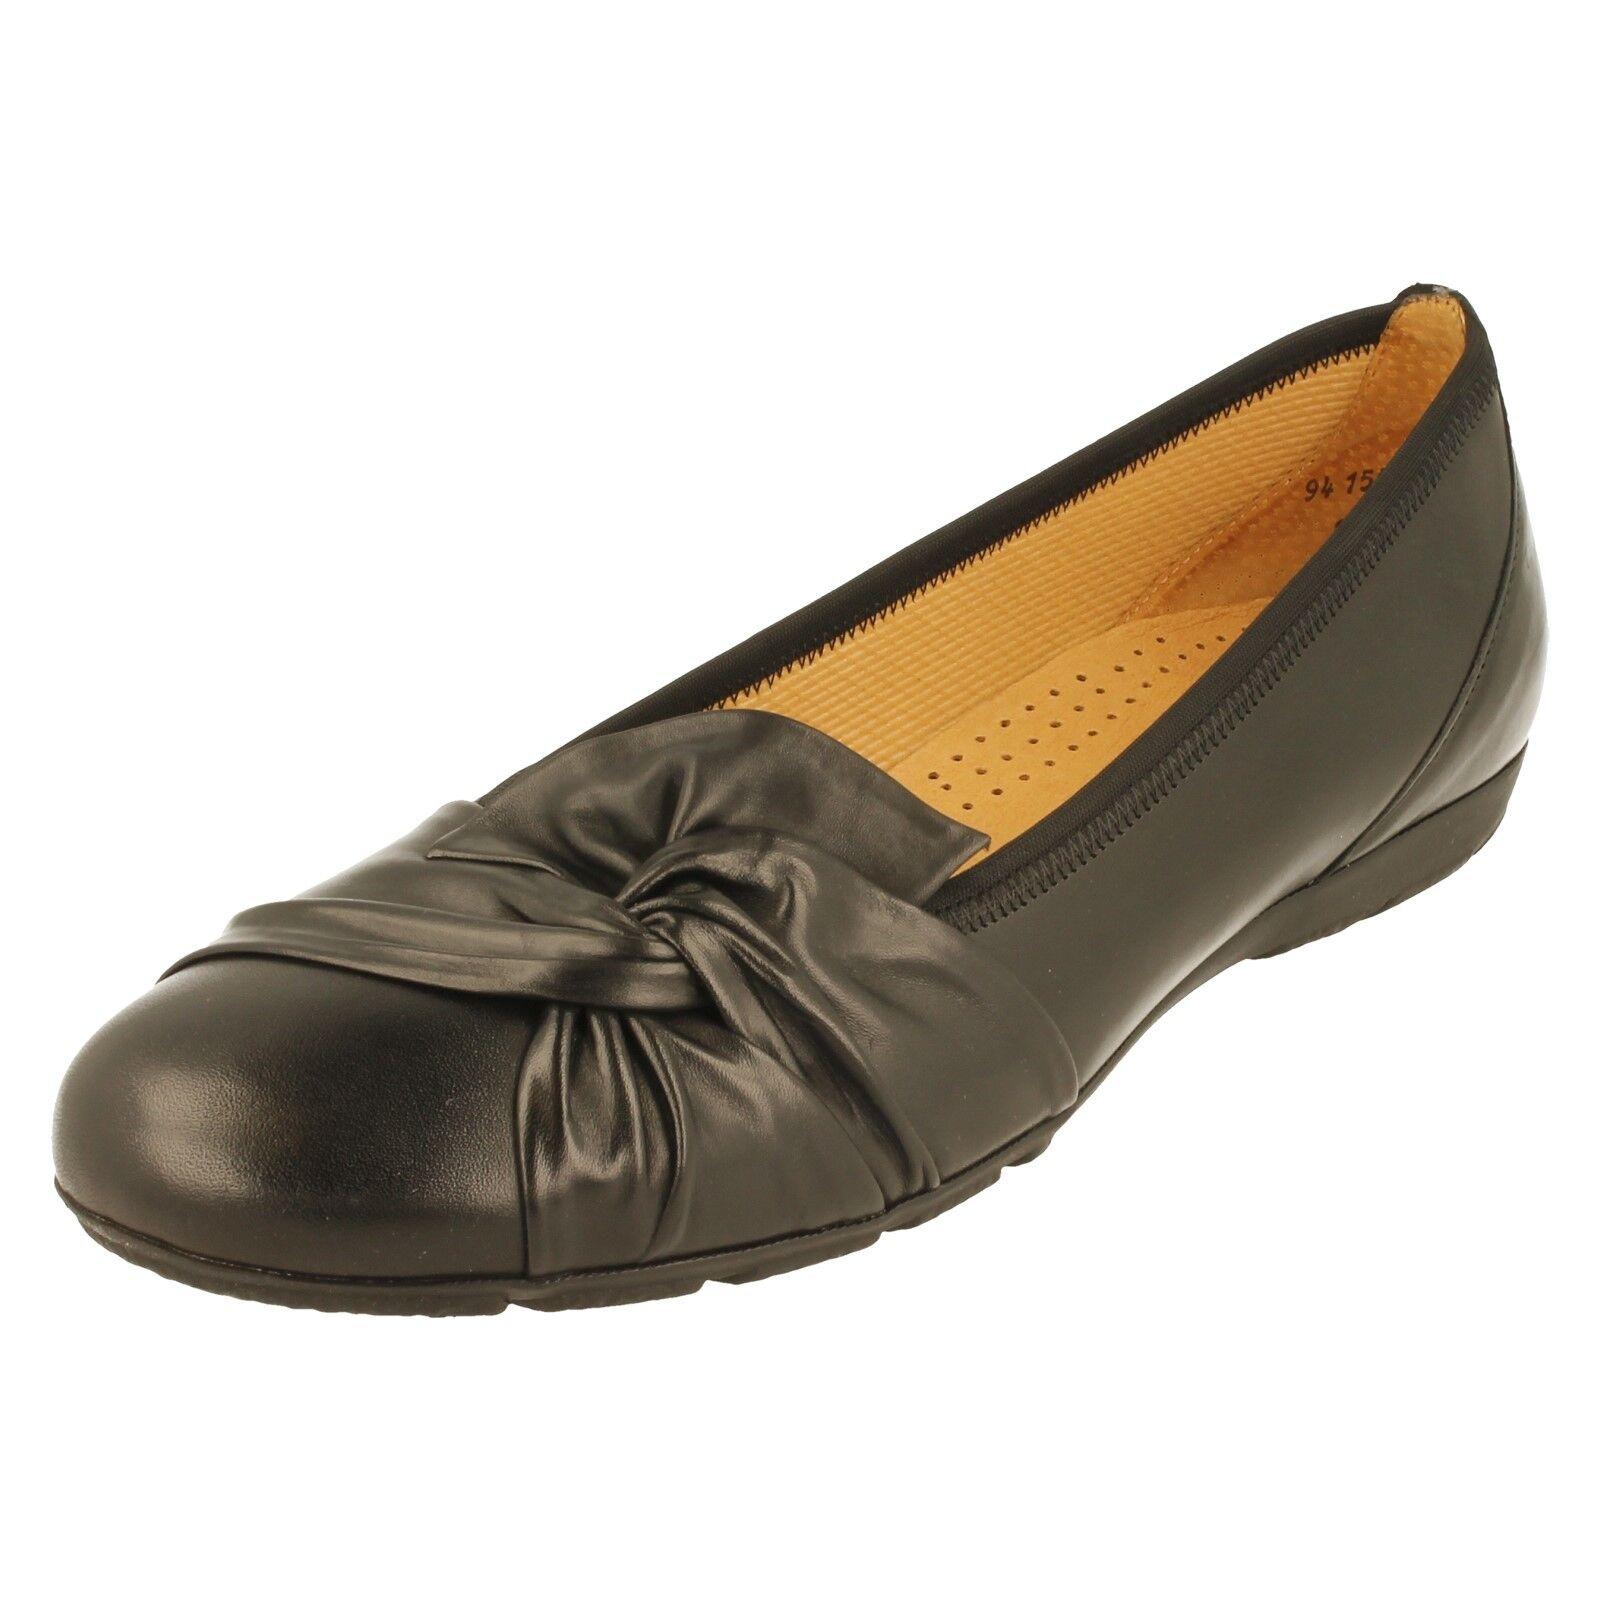 Ladies Gabor Flats Style - 94150 94150 - db51c1